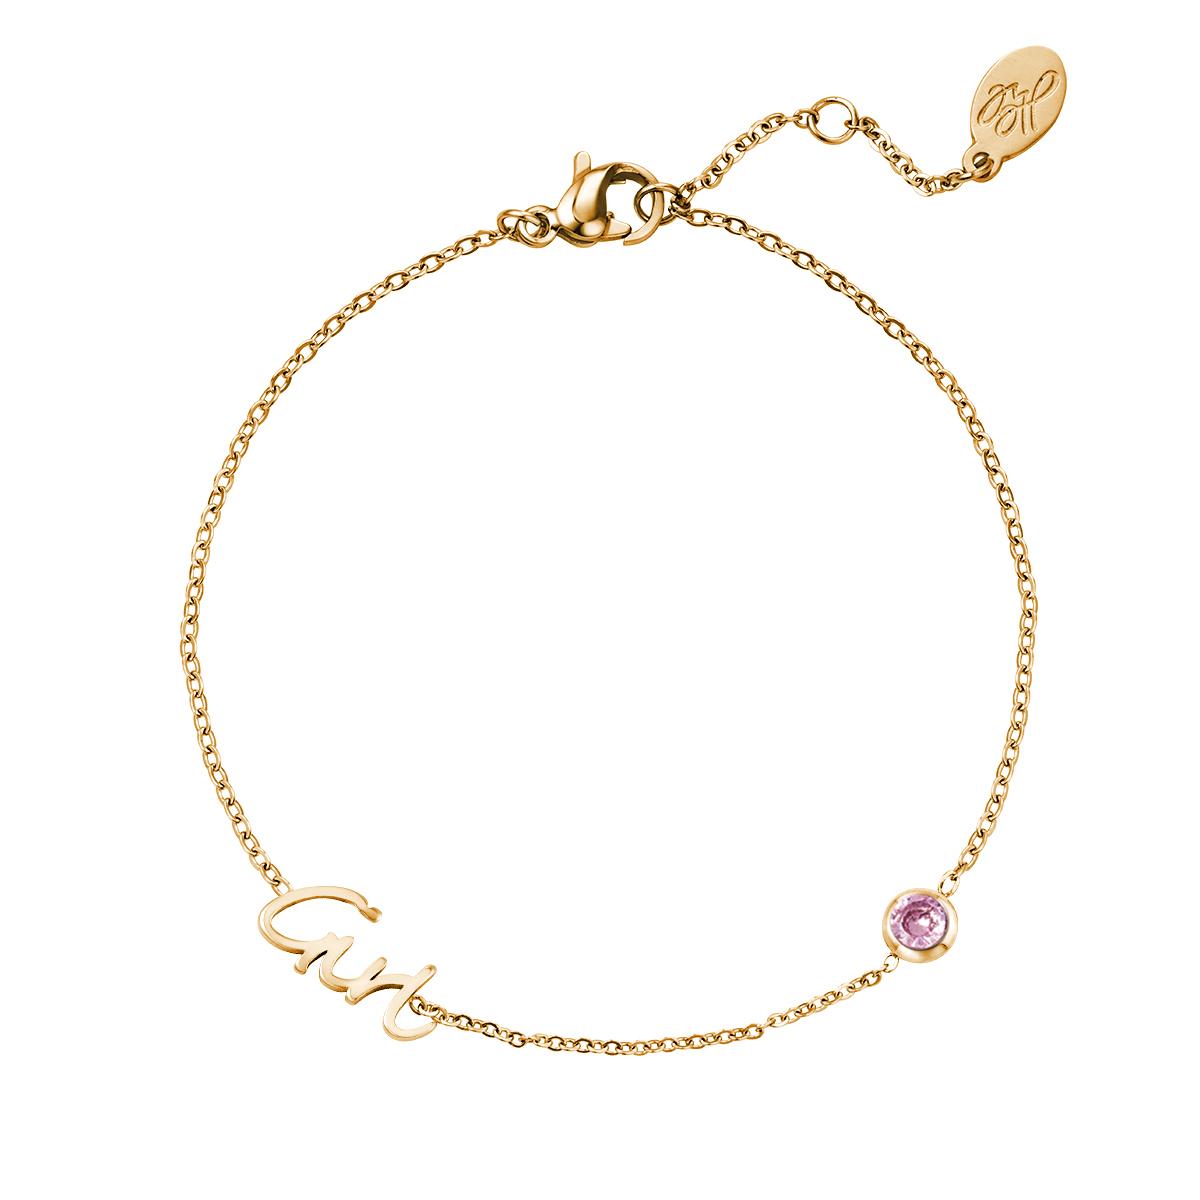 Geboortesteen Armband Goud Meisje